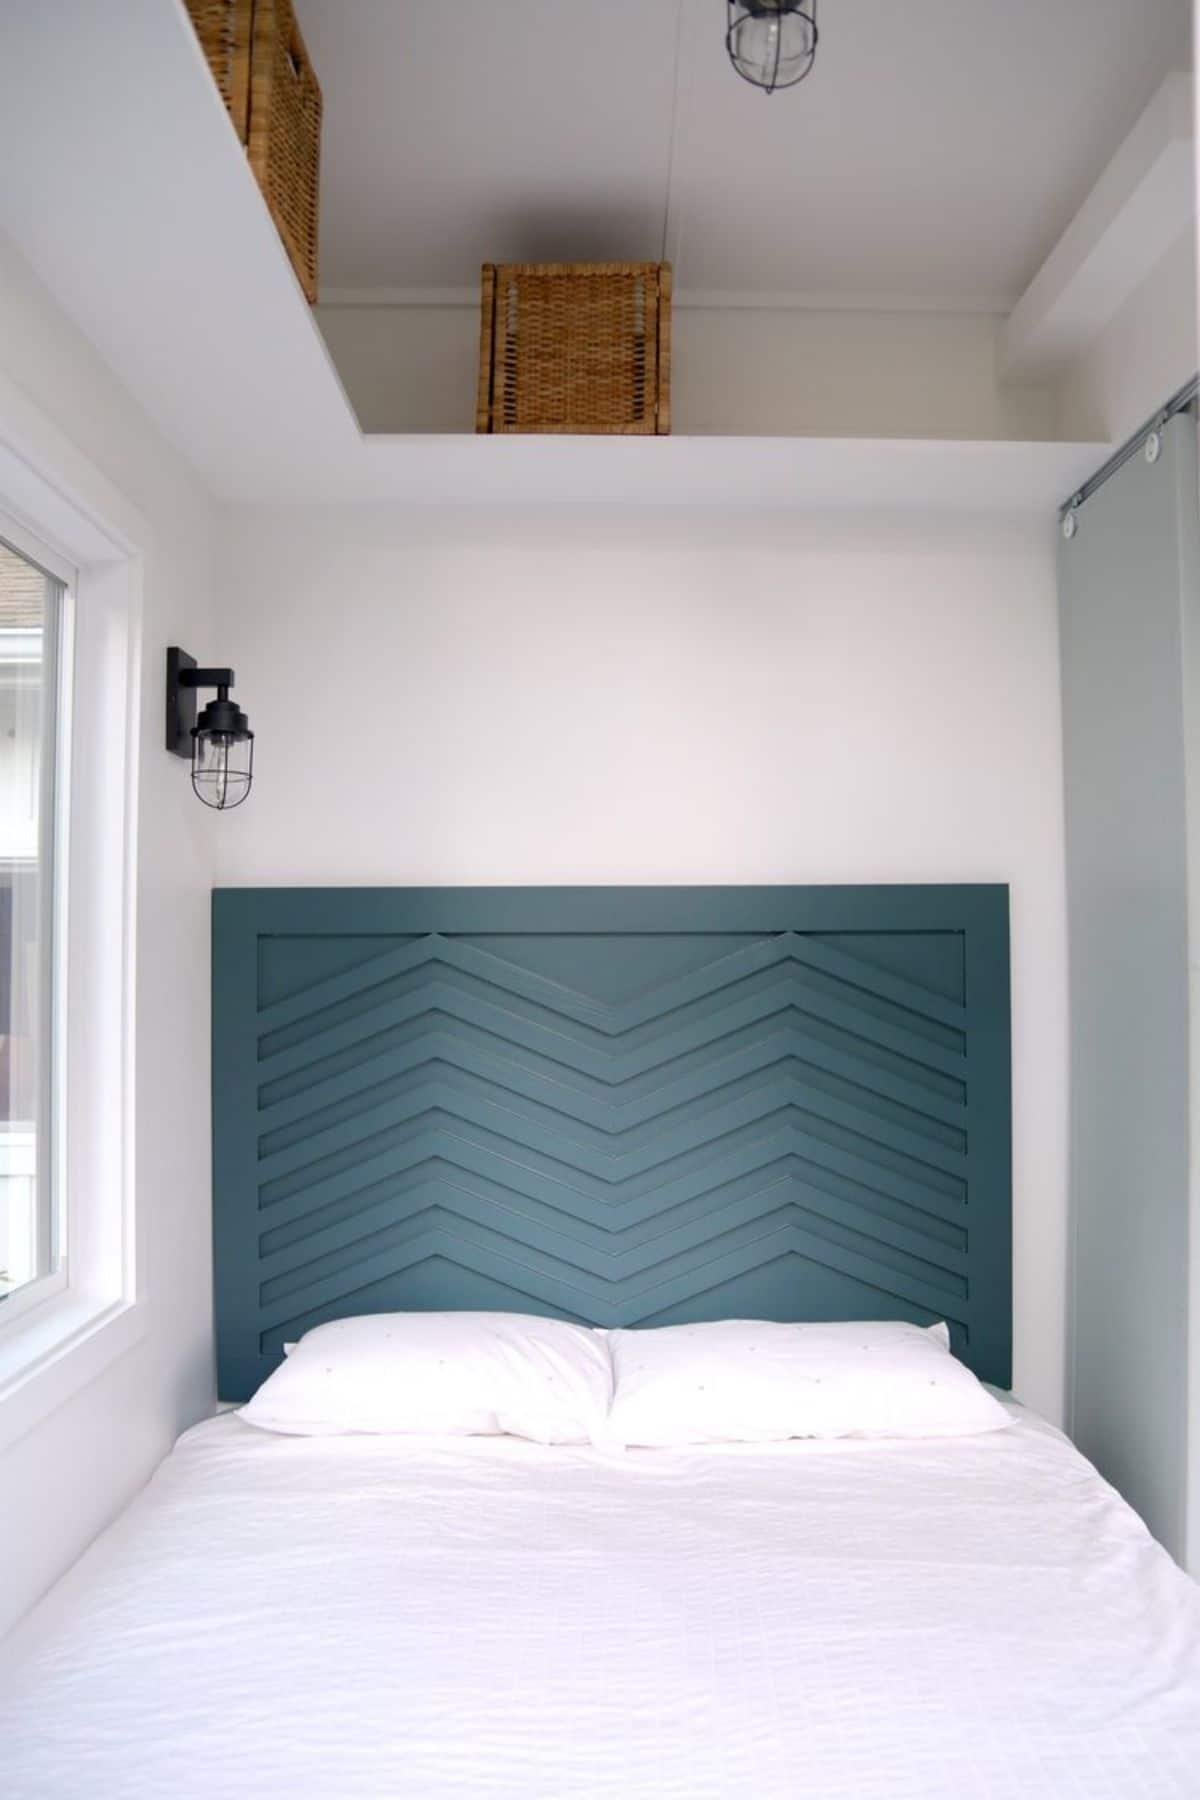 Teal headboard on twin bed in tiny bedroom